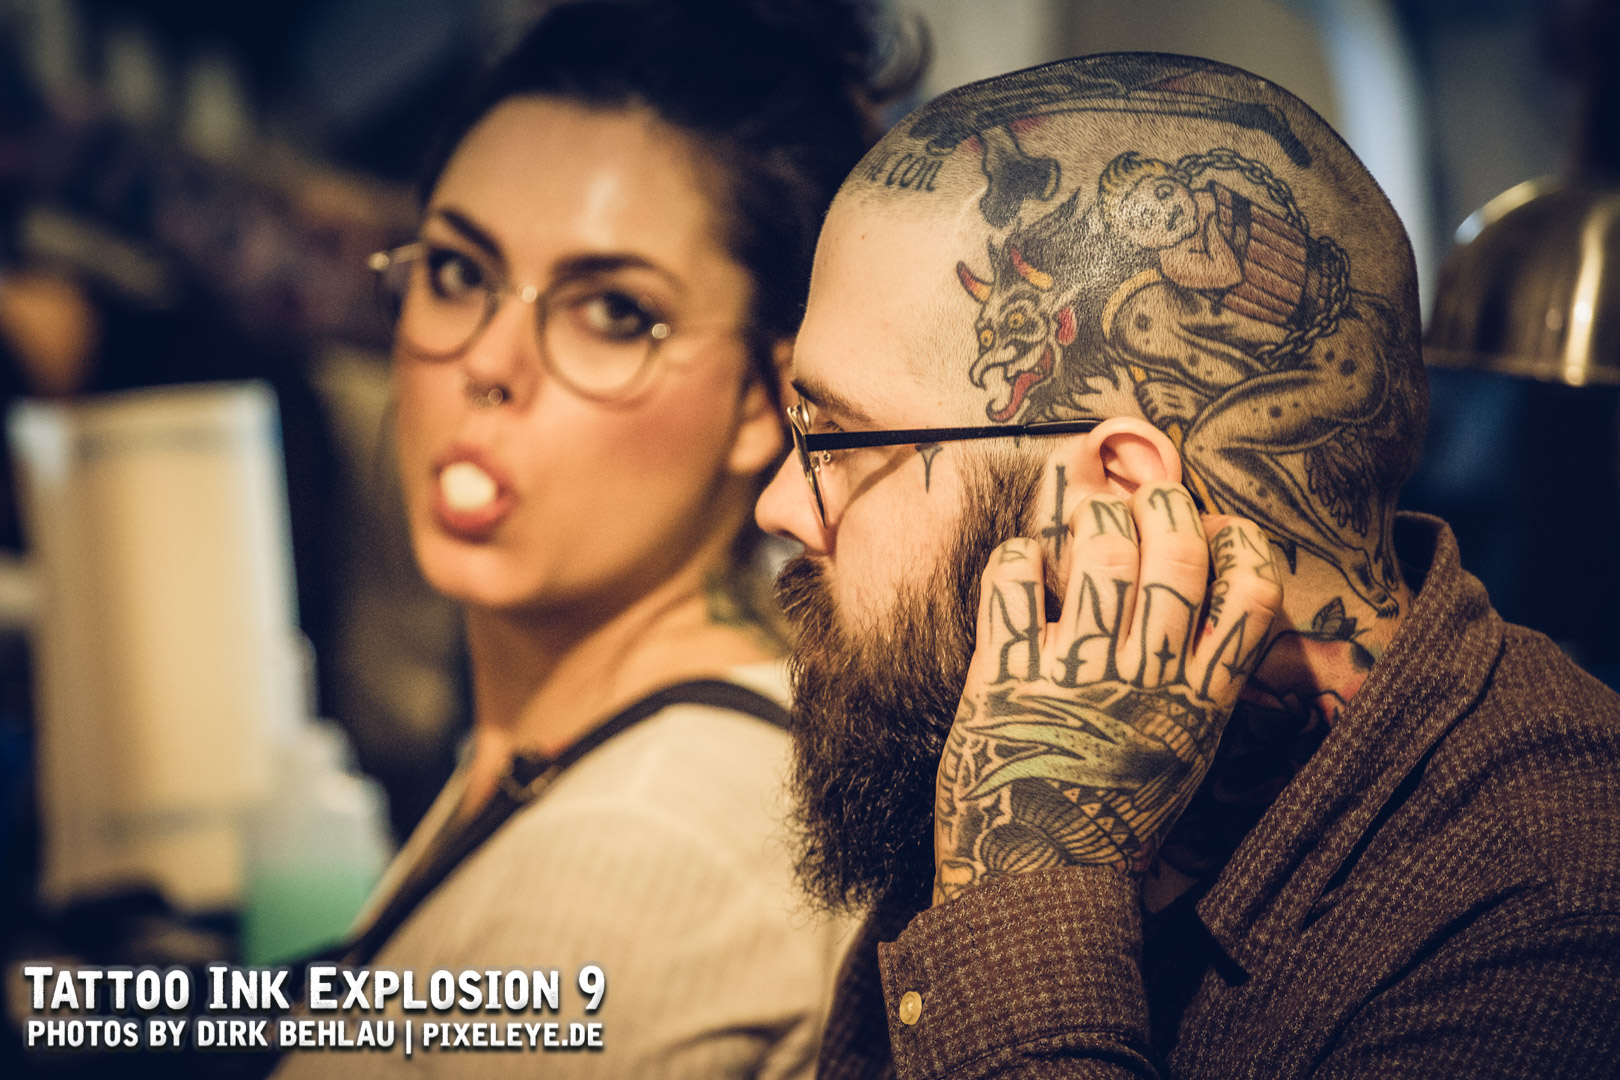 Tattoo Ink Explosion 2018 WEB by Dirk Behlau-1312.jpg